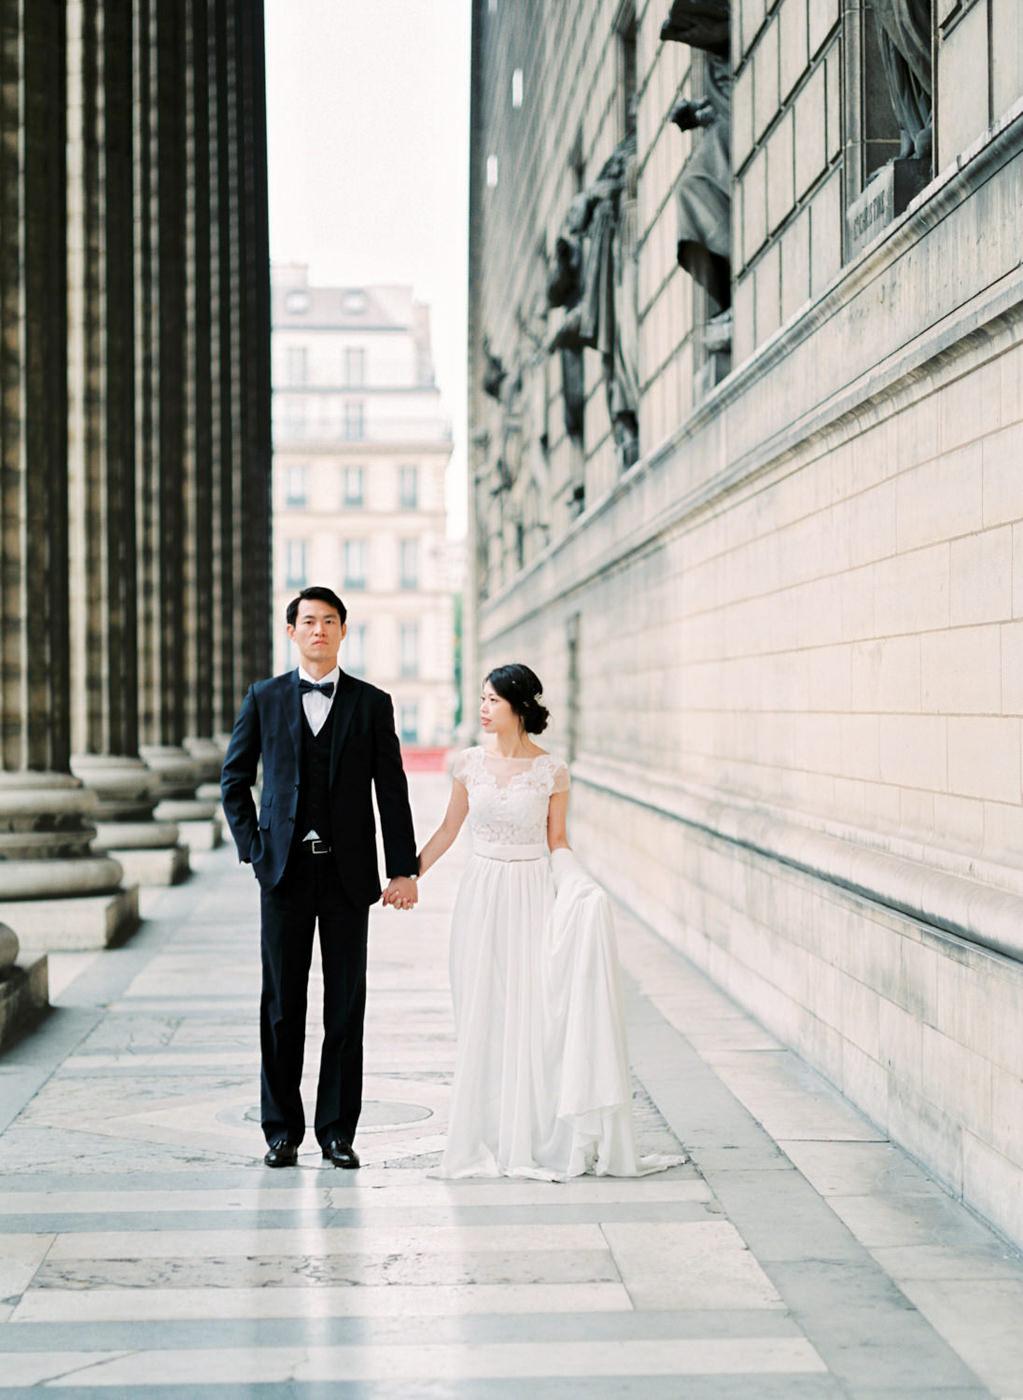 Paris Wedding Photography